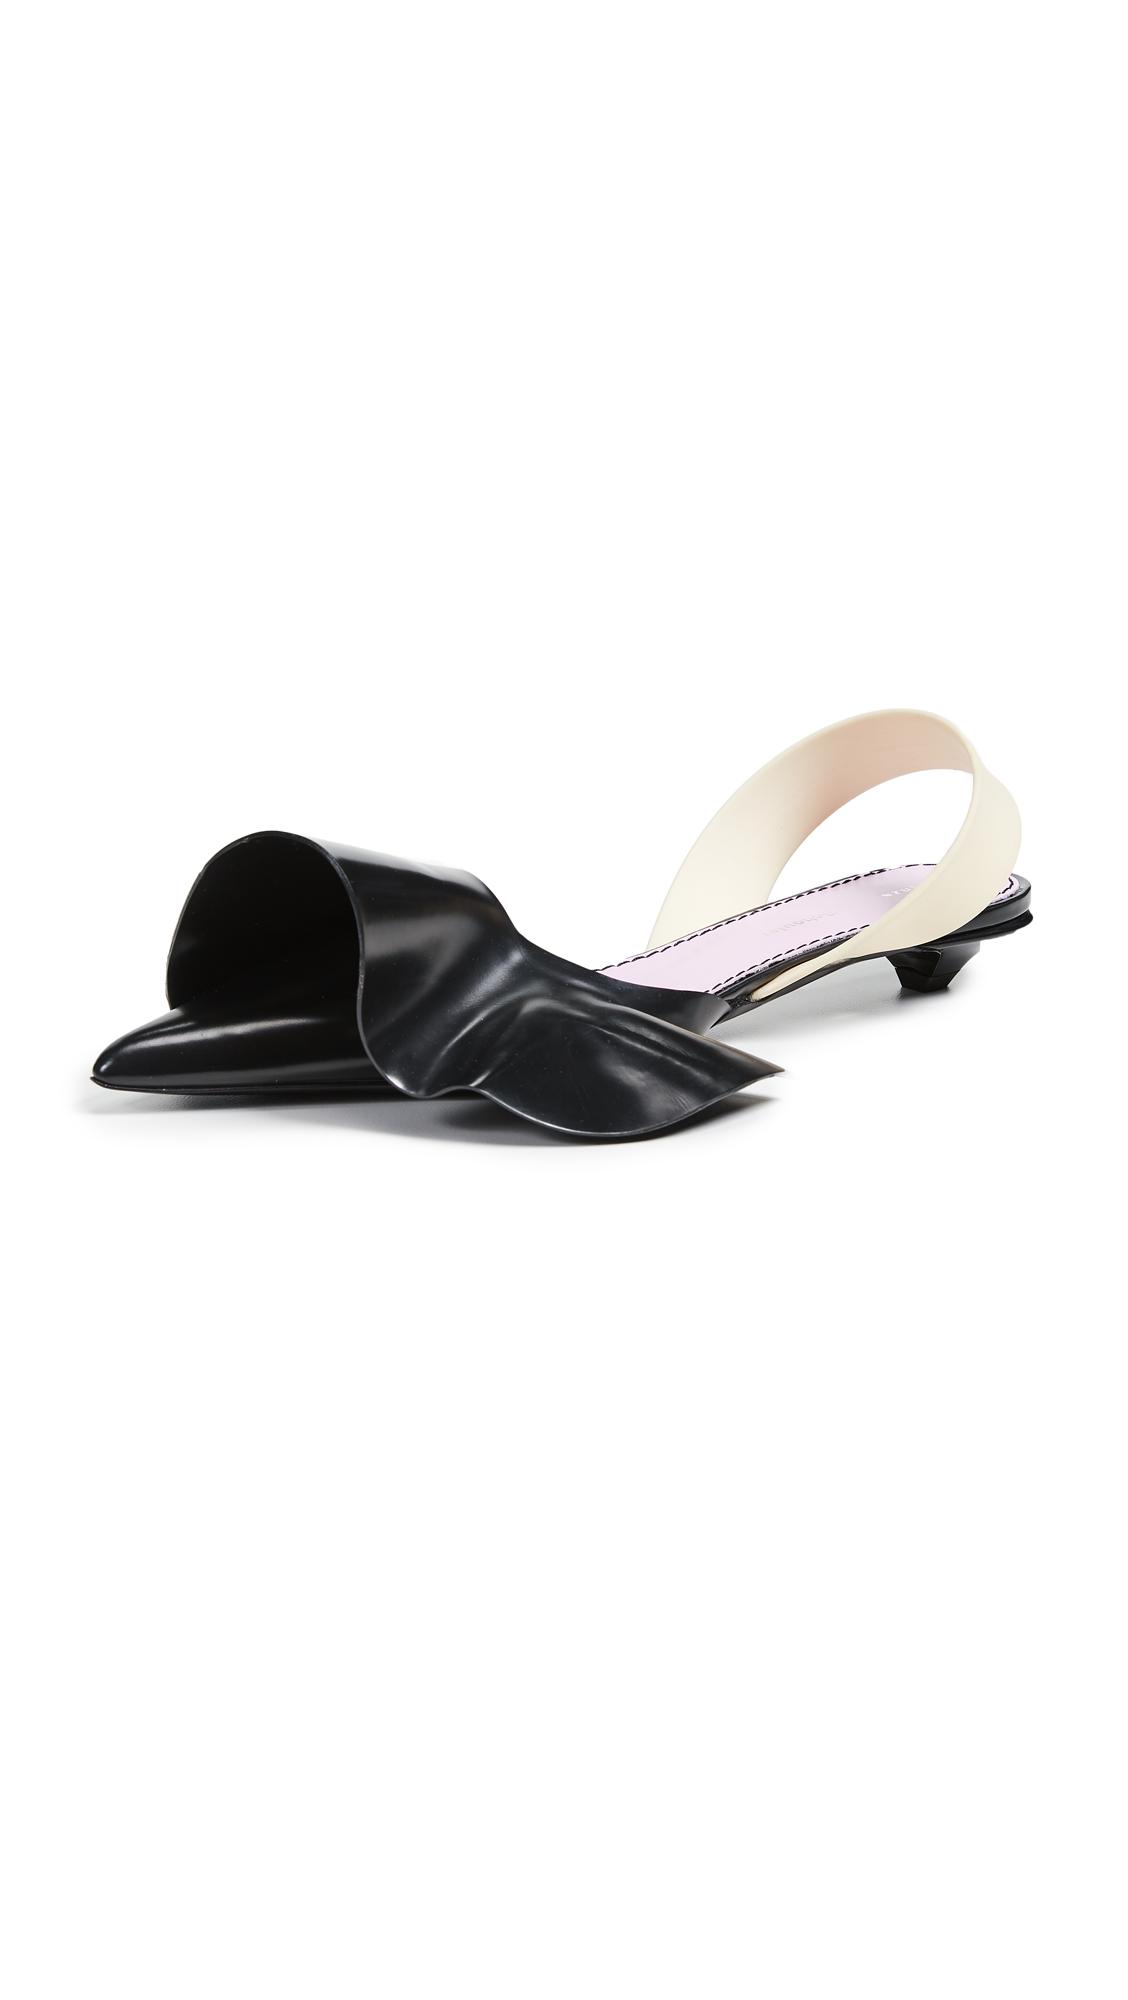 Proenza Schouler Ruffle Kitten Heel Flats